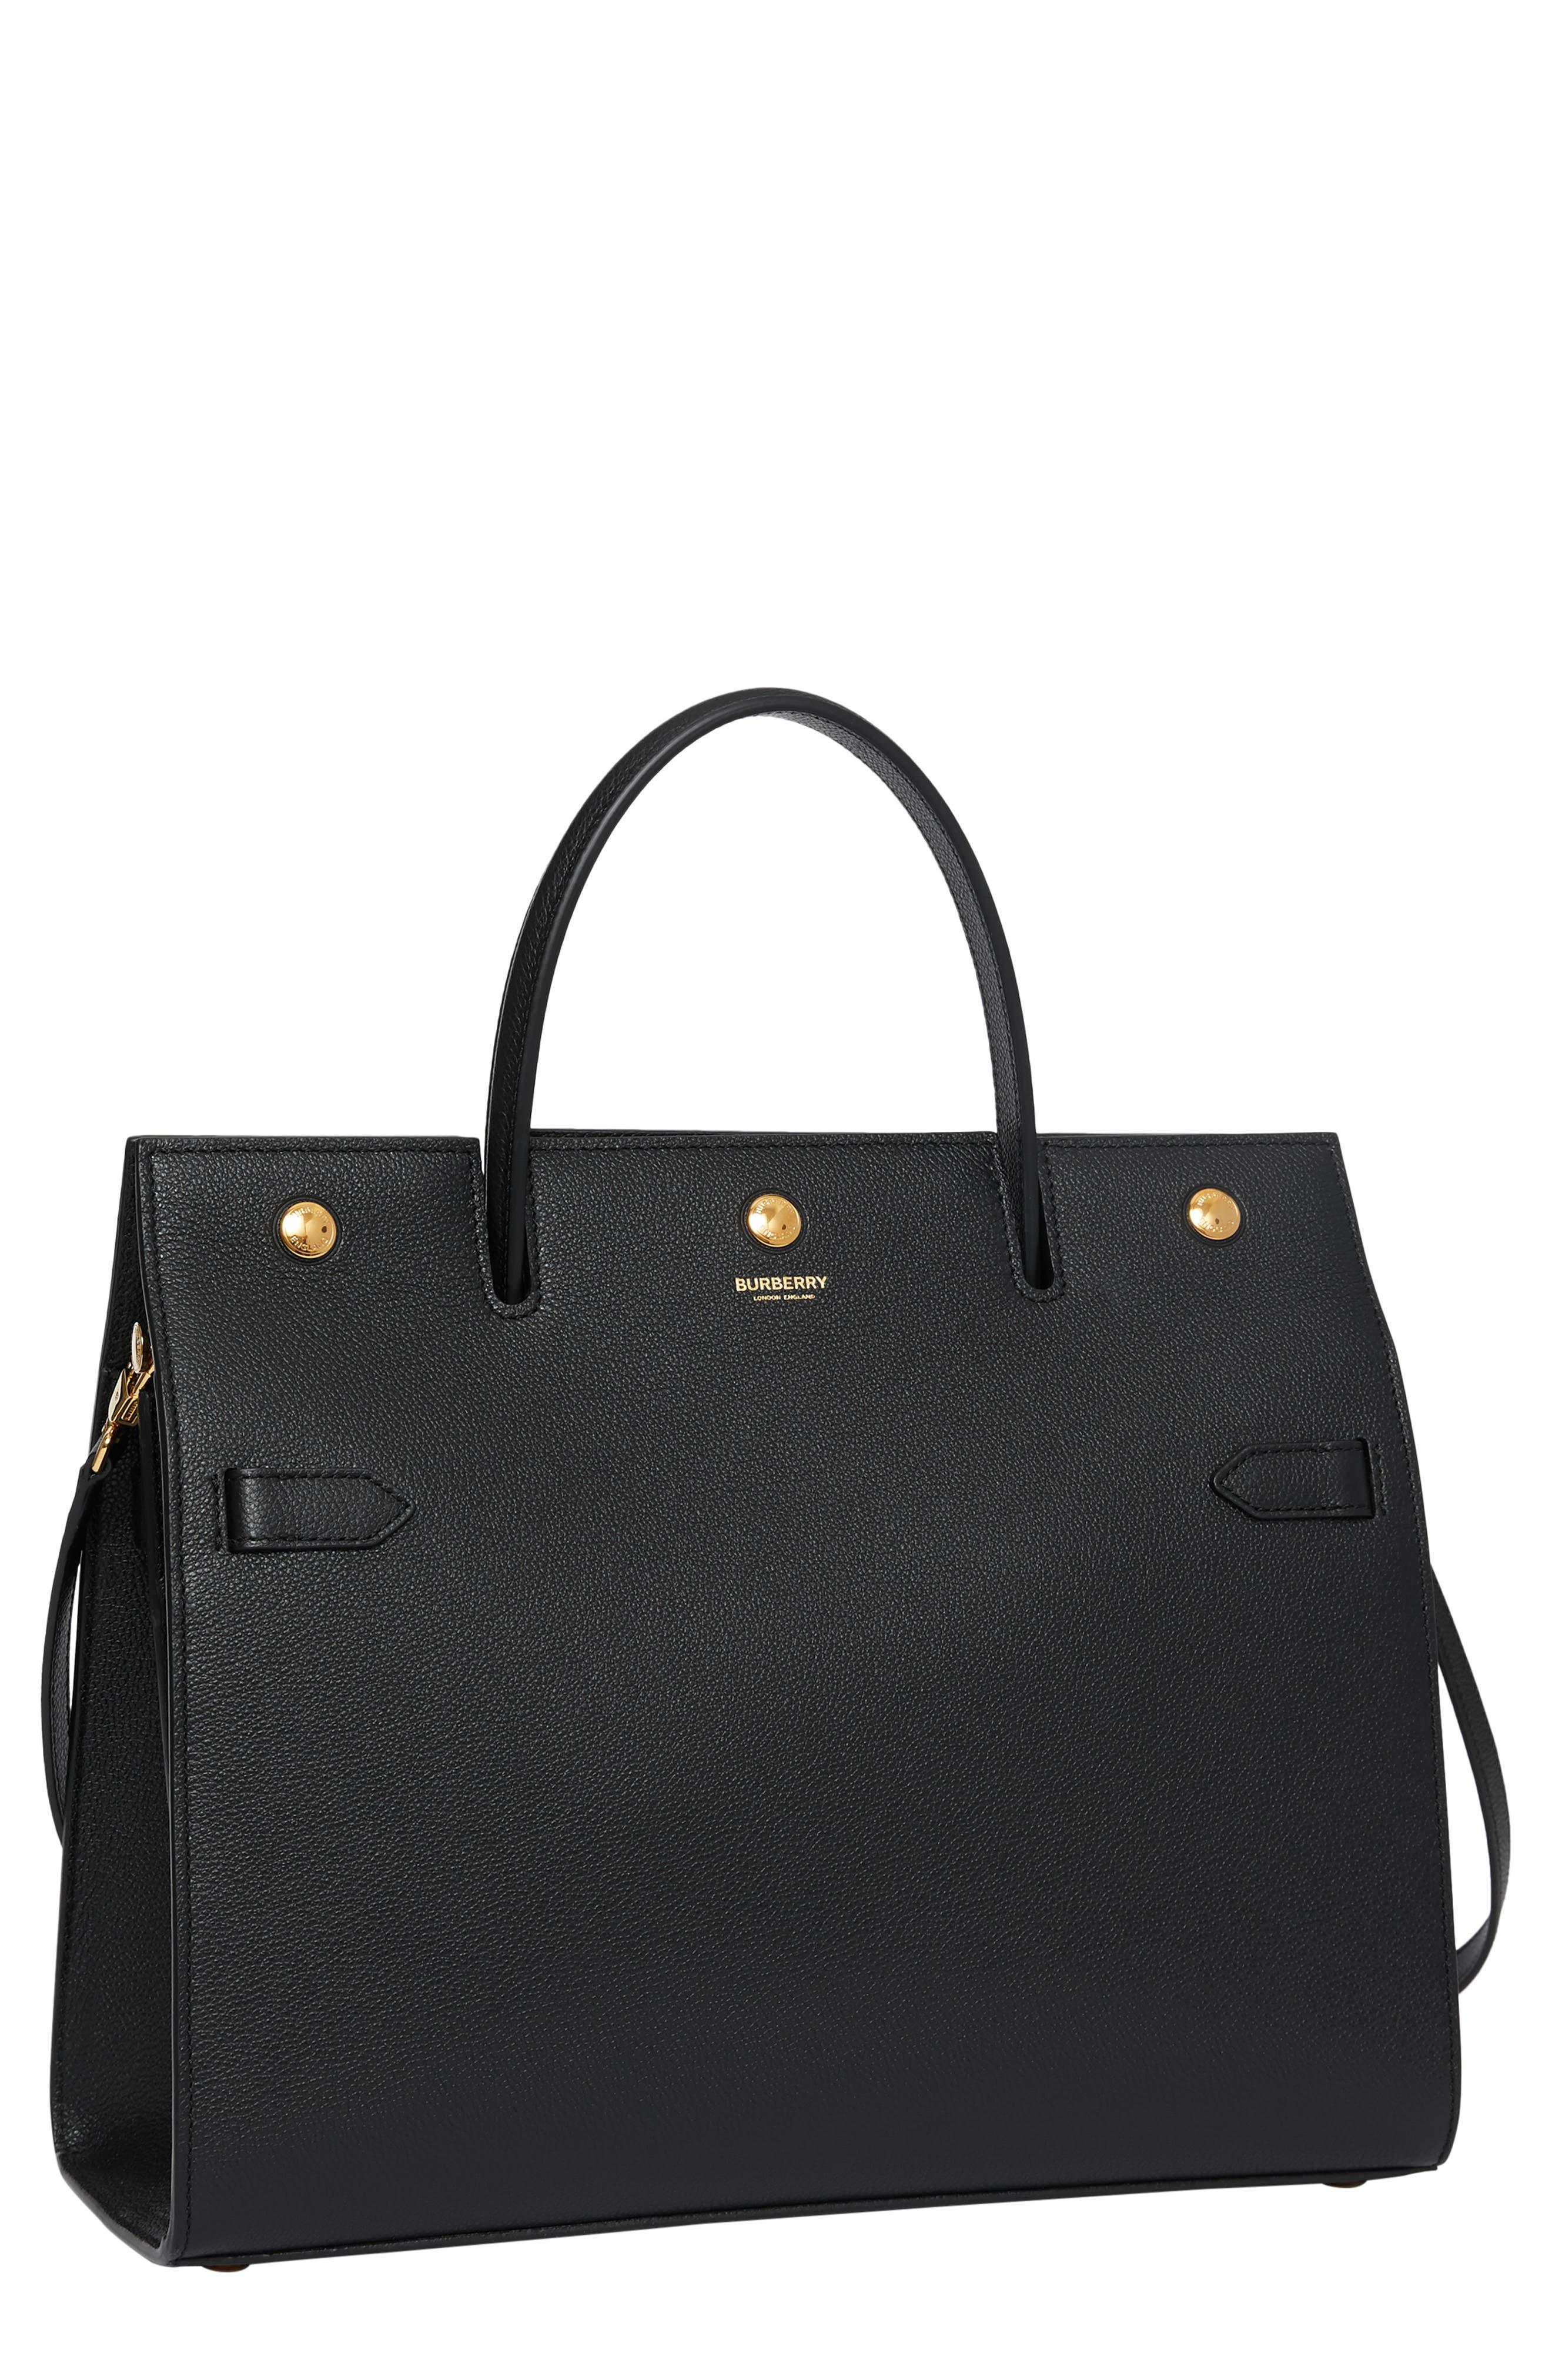 Burberry Medium Title Leather Bag   Nordstrom